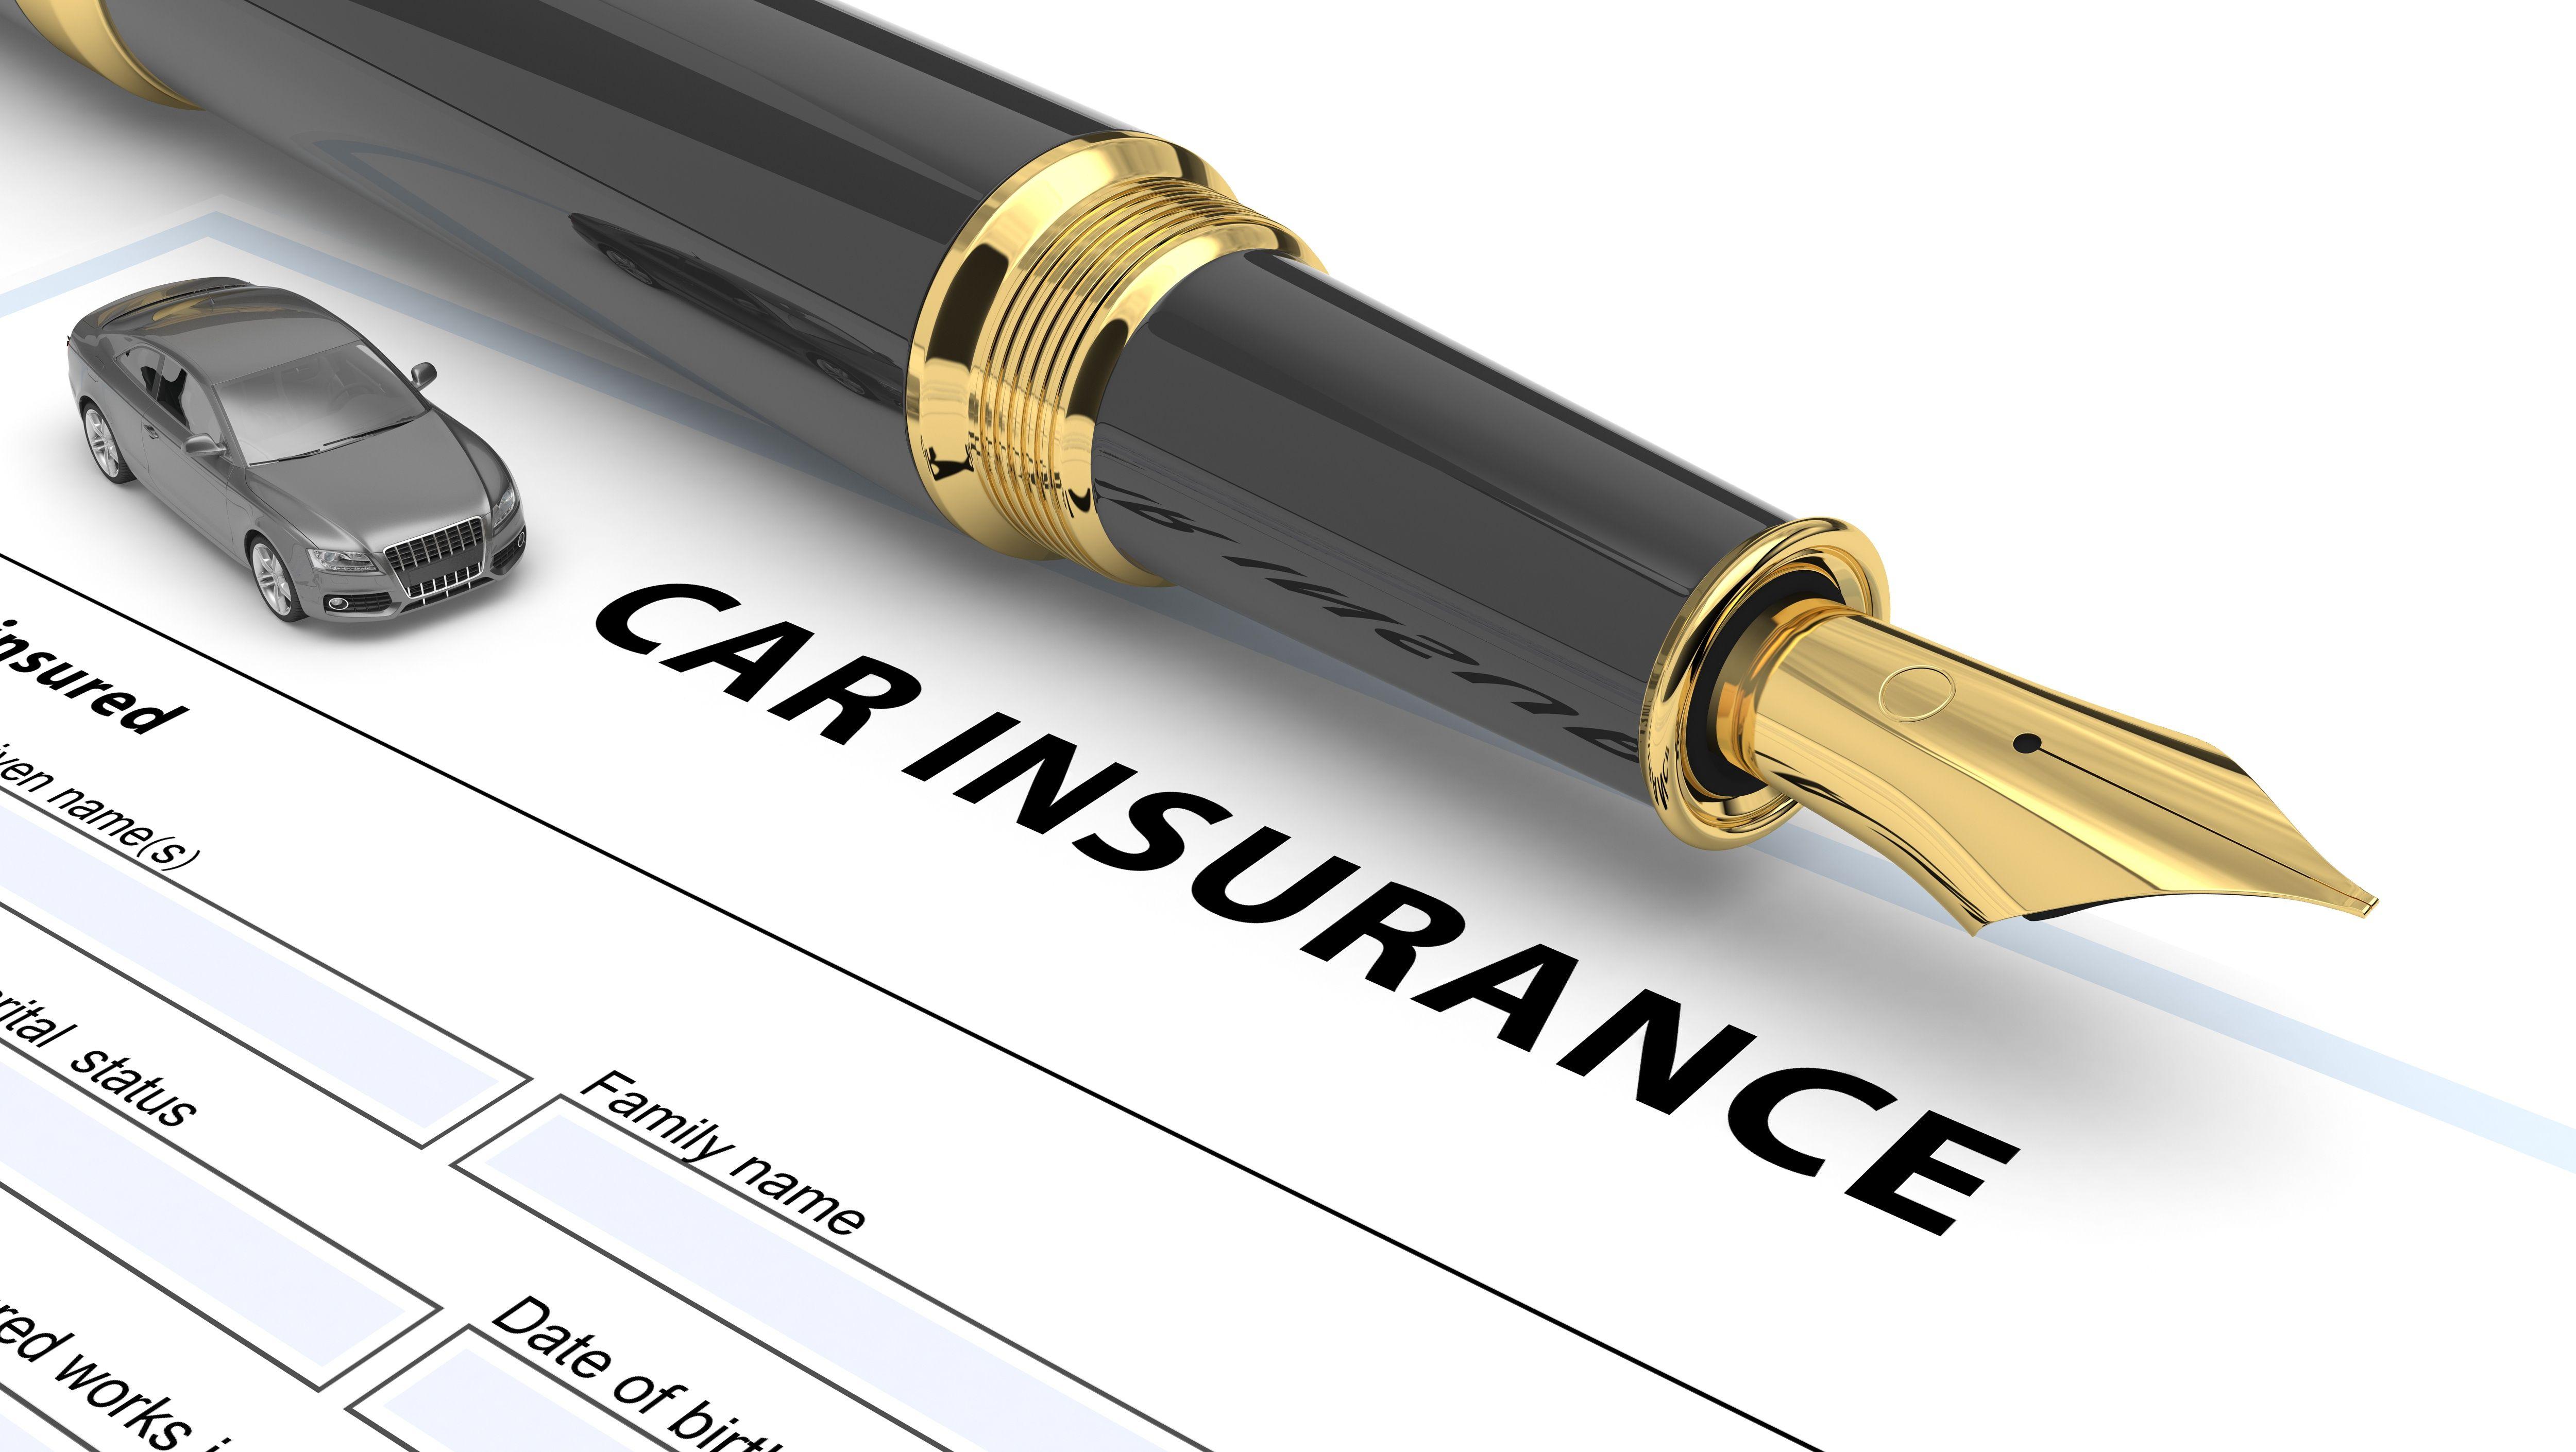 When You Browse Reducemybilltoday You Can Compare Insurance